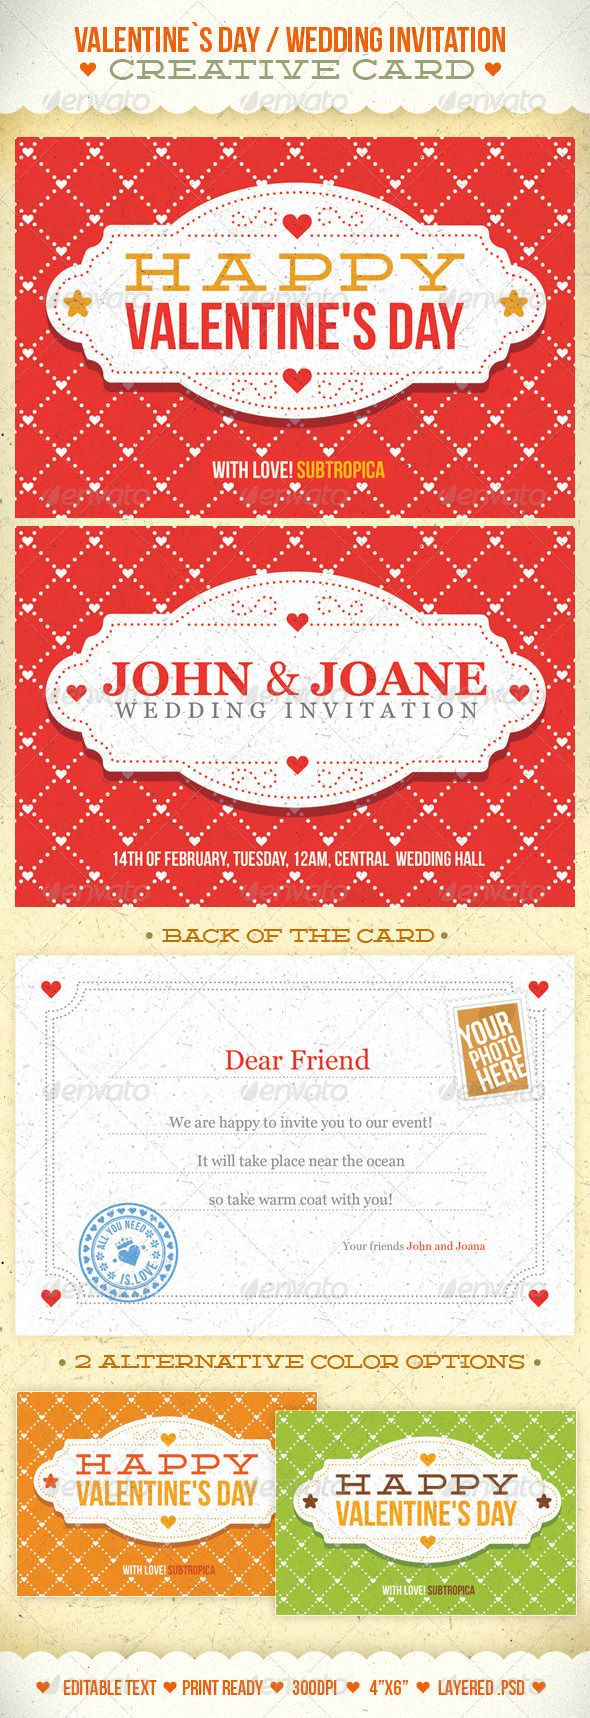 Valentine\'s Day And Wedding Invitation Postcard | Wedding invitation ...